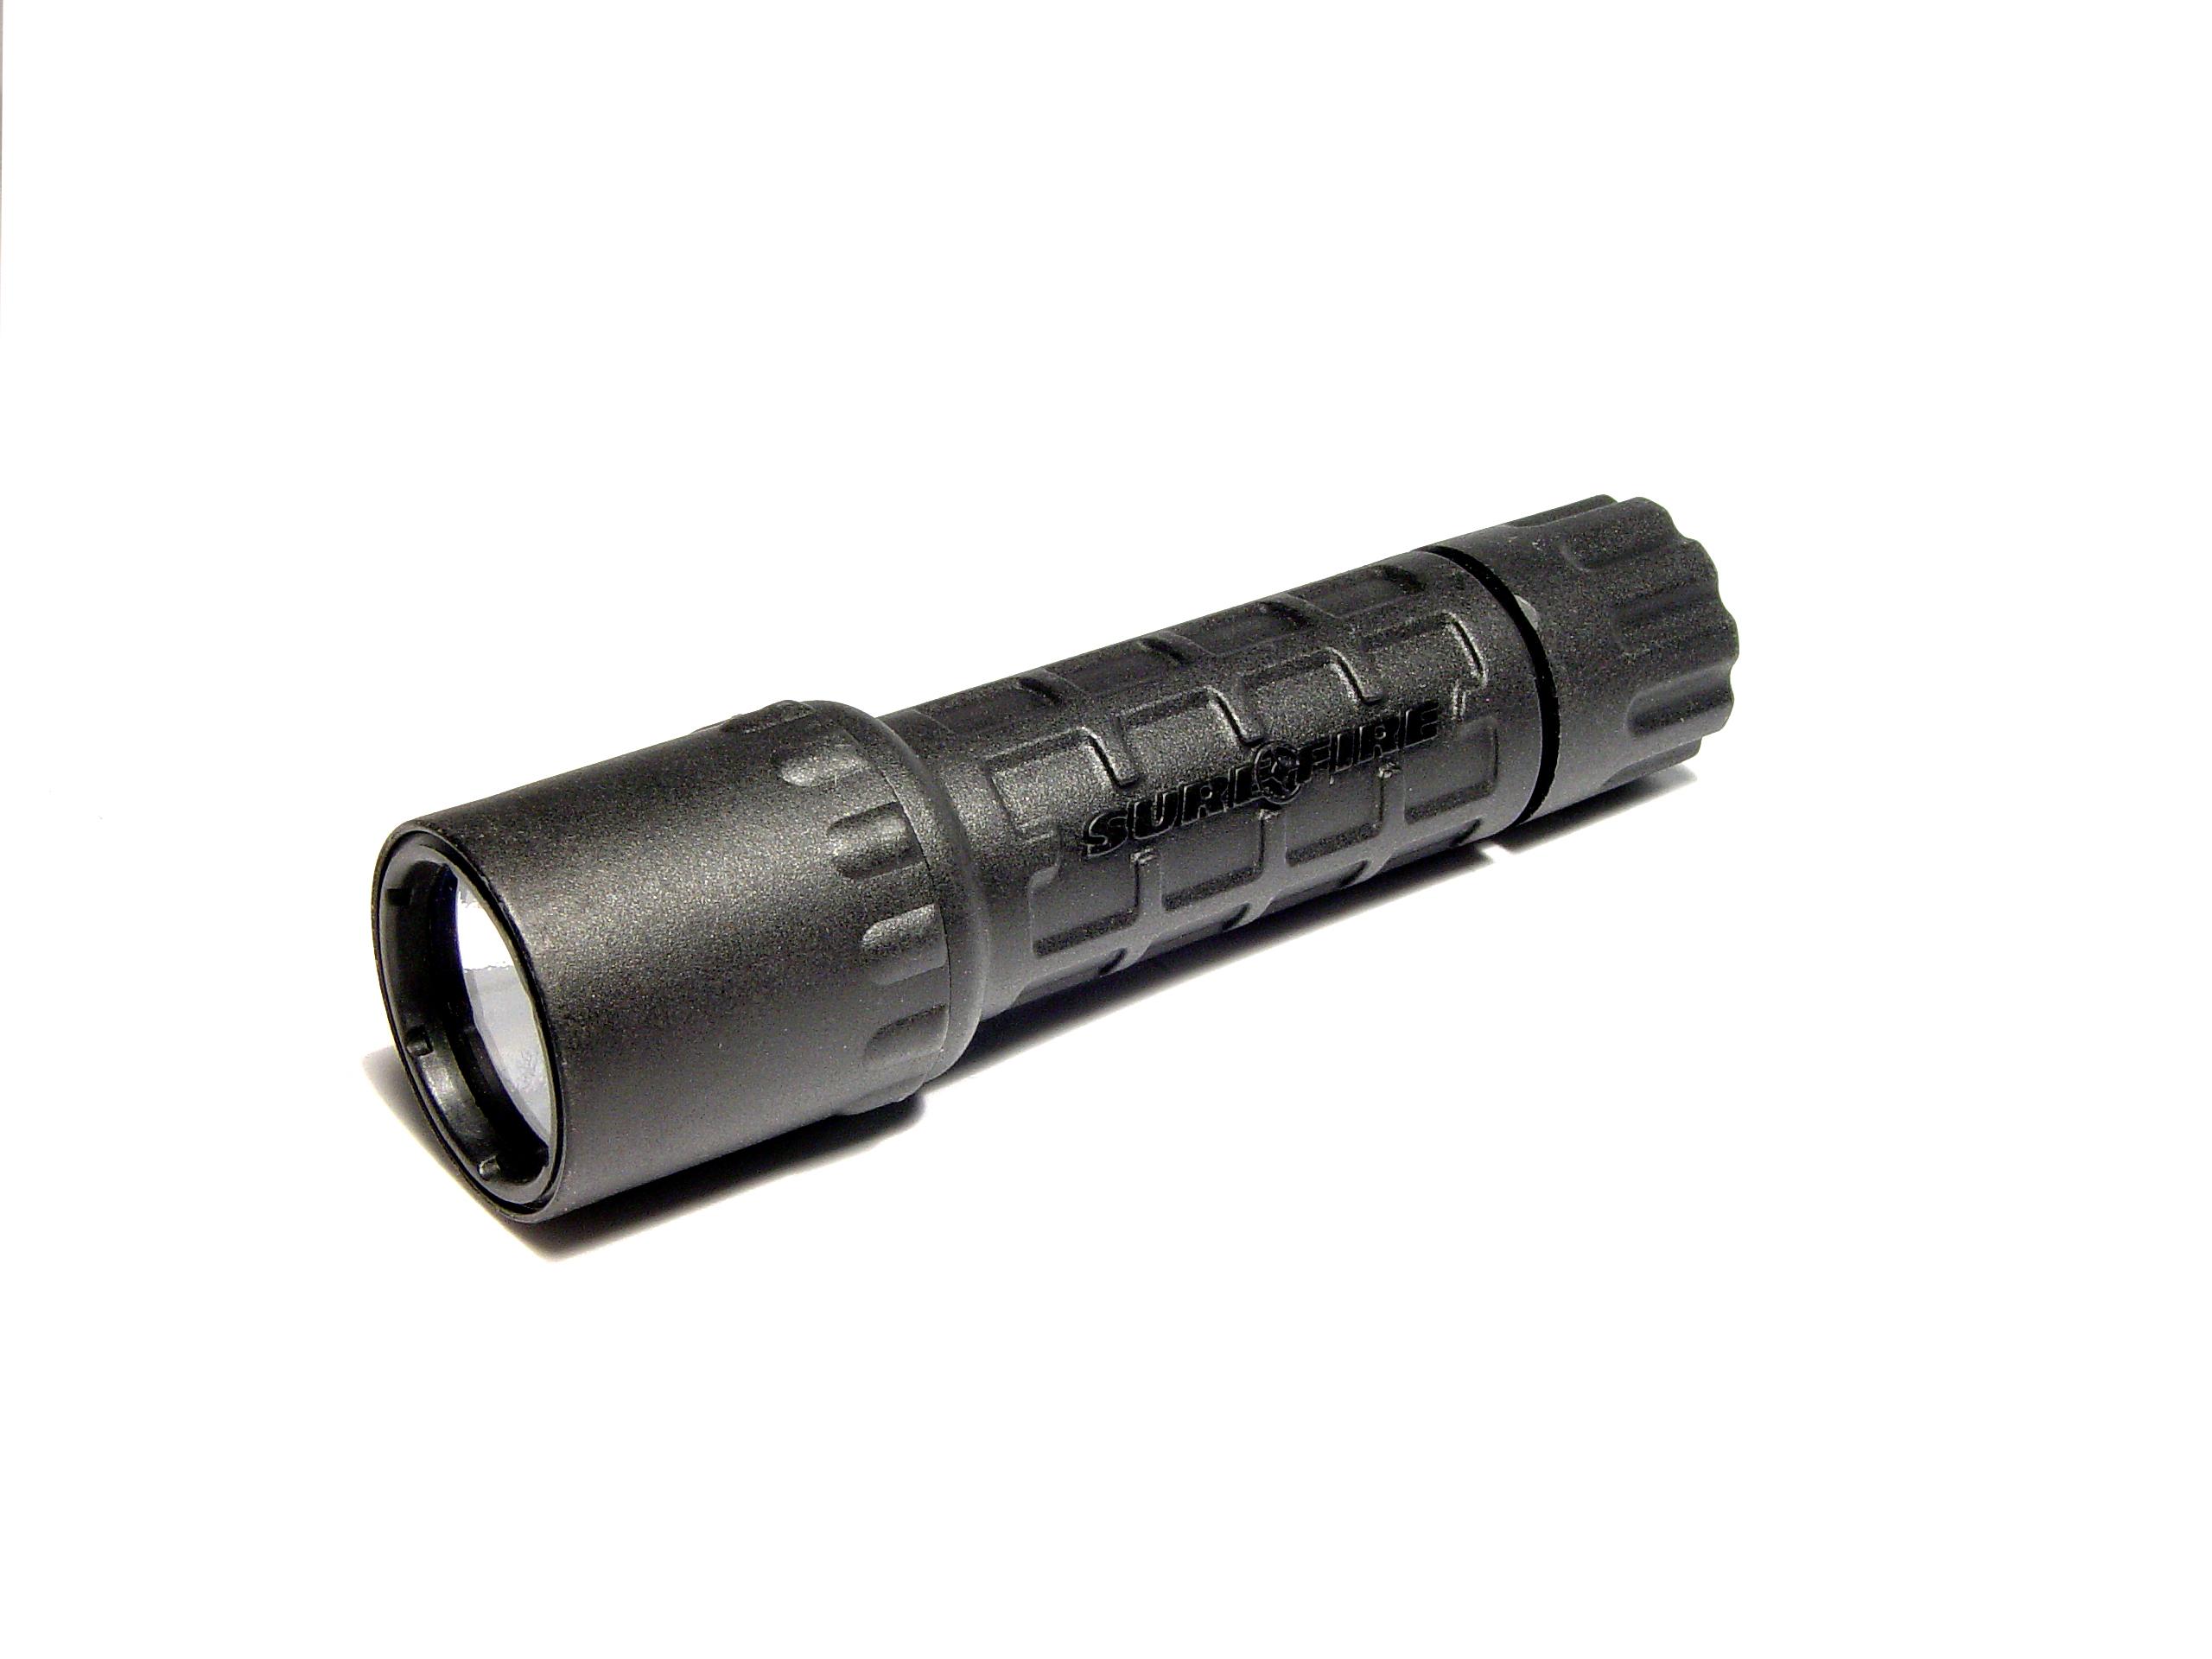 Black Surefire G2 Nitrolon Single Output Extremely White 17650 Flashlight 6p for sale online